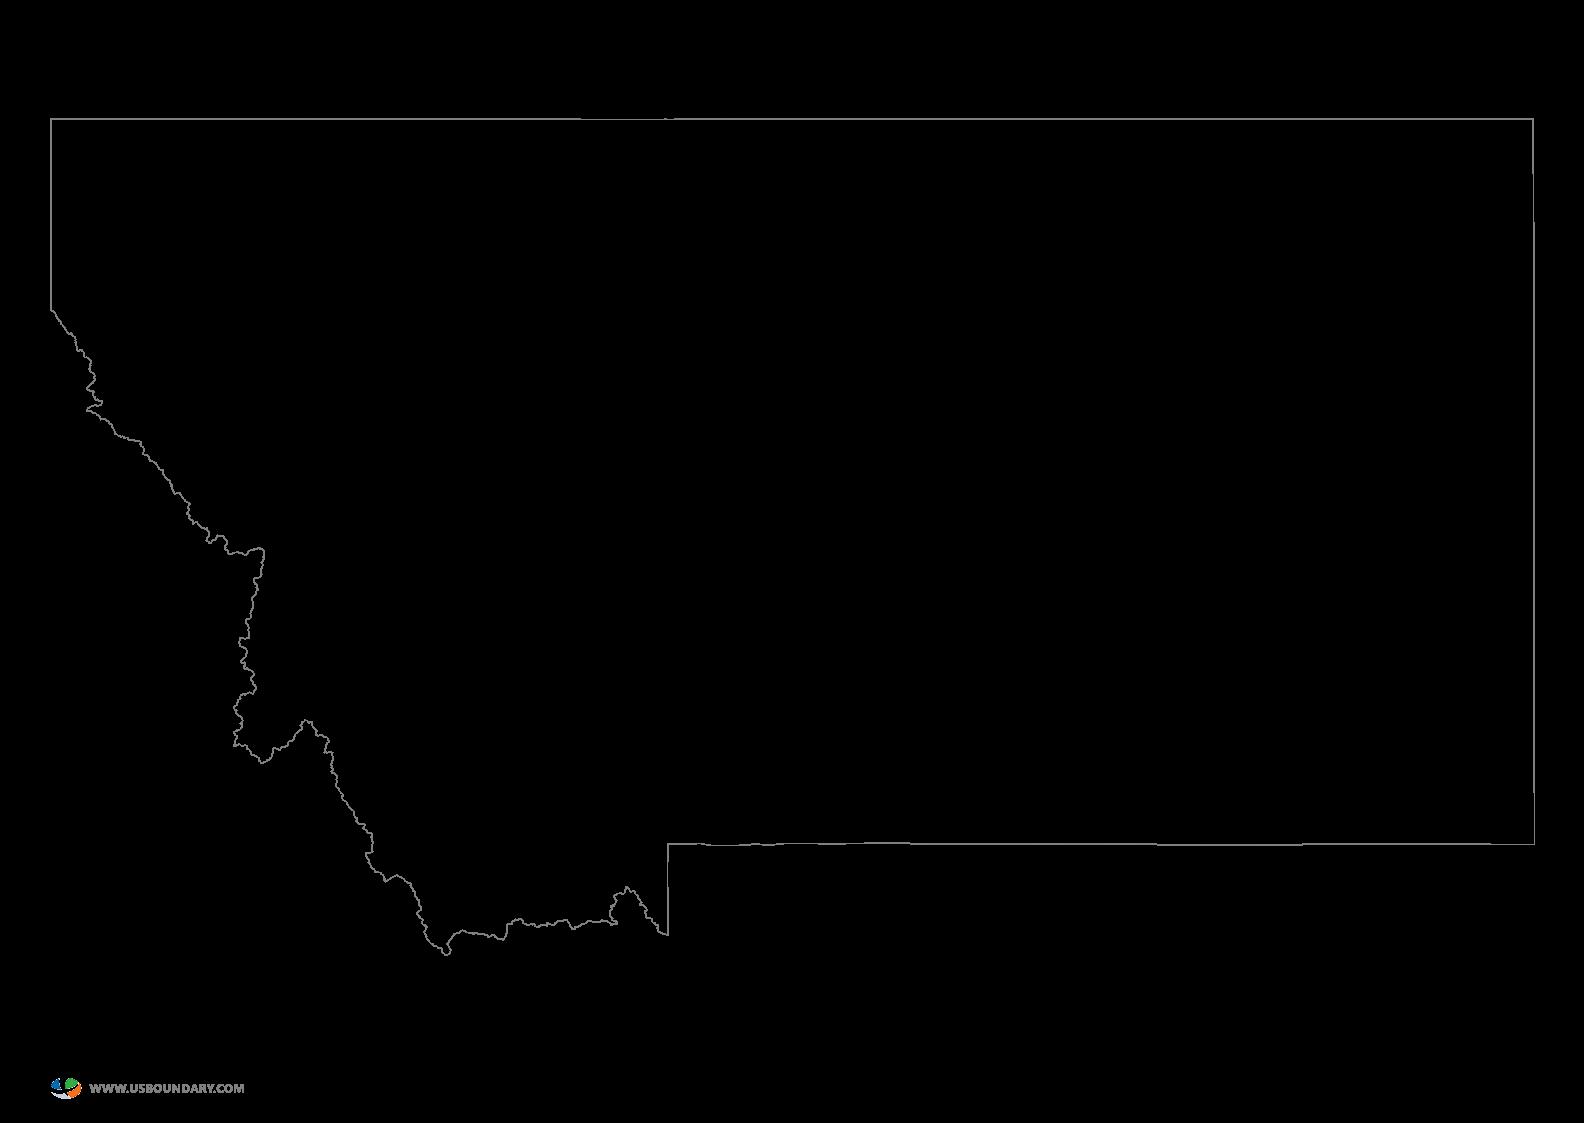 Montana Outline Vector